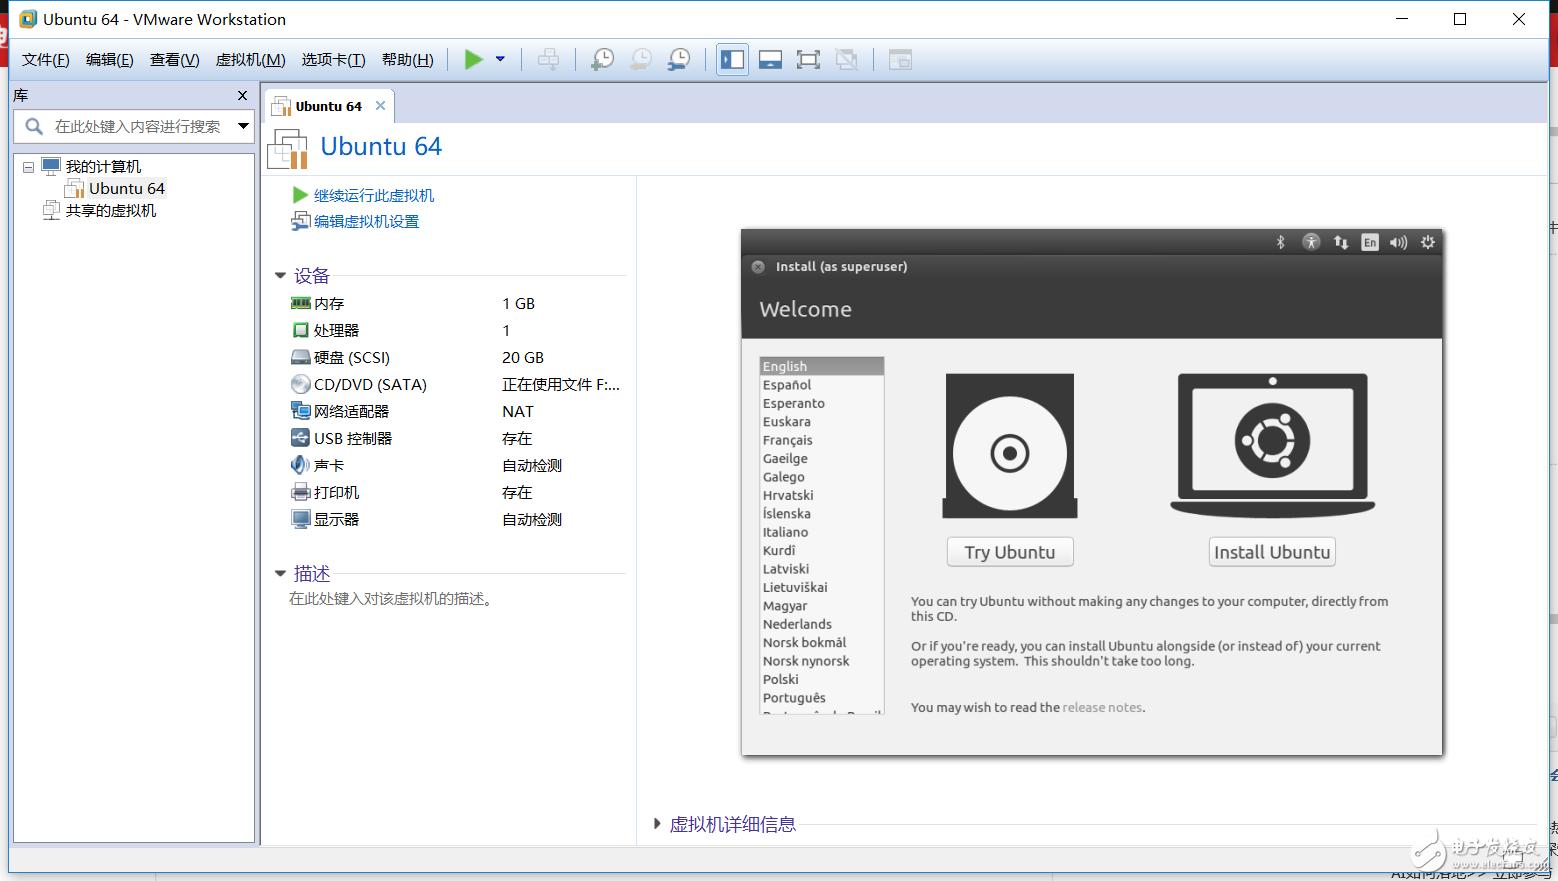 VMwave无法安装Ubuntu,望解析